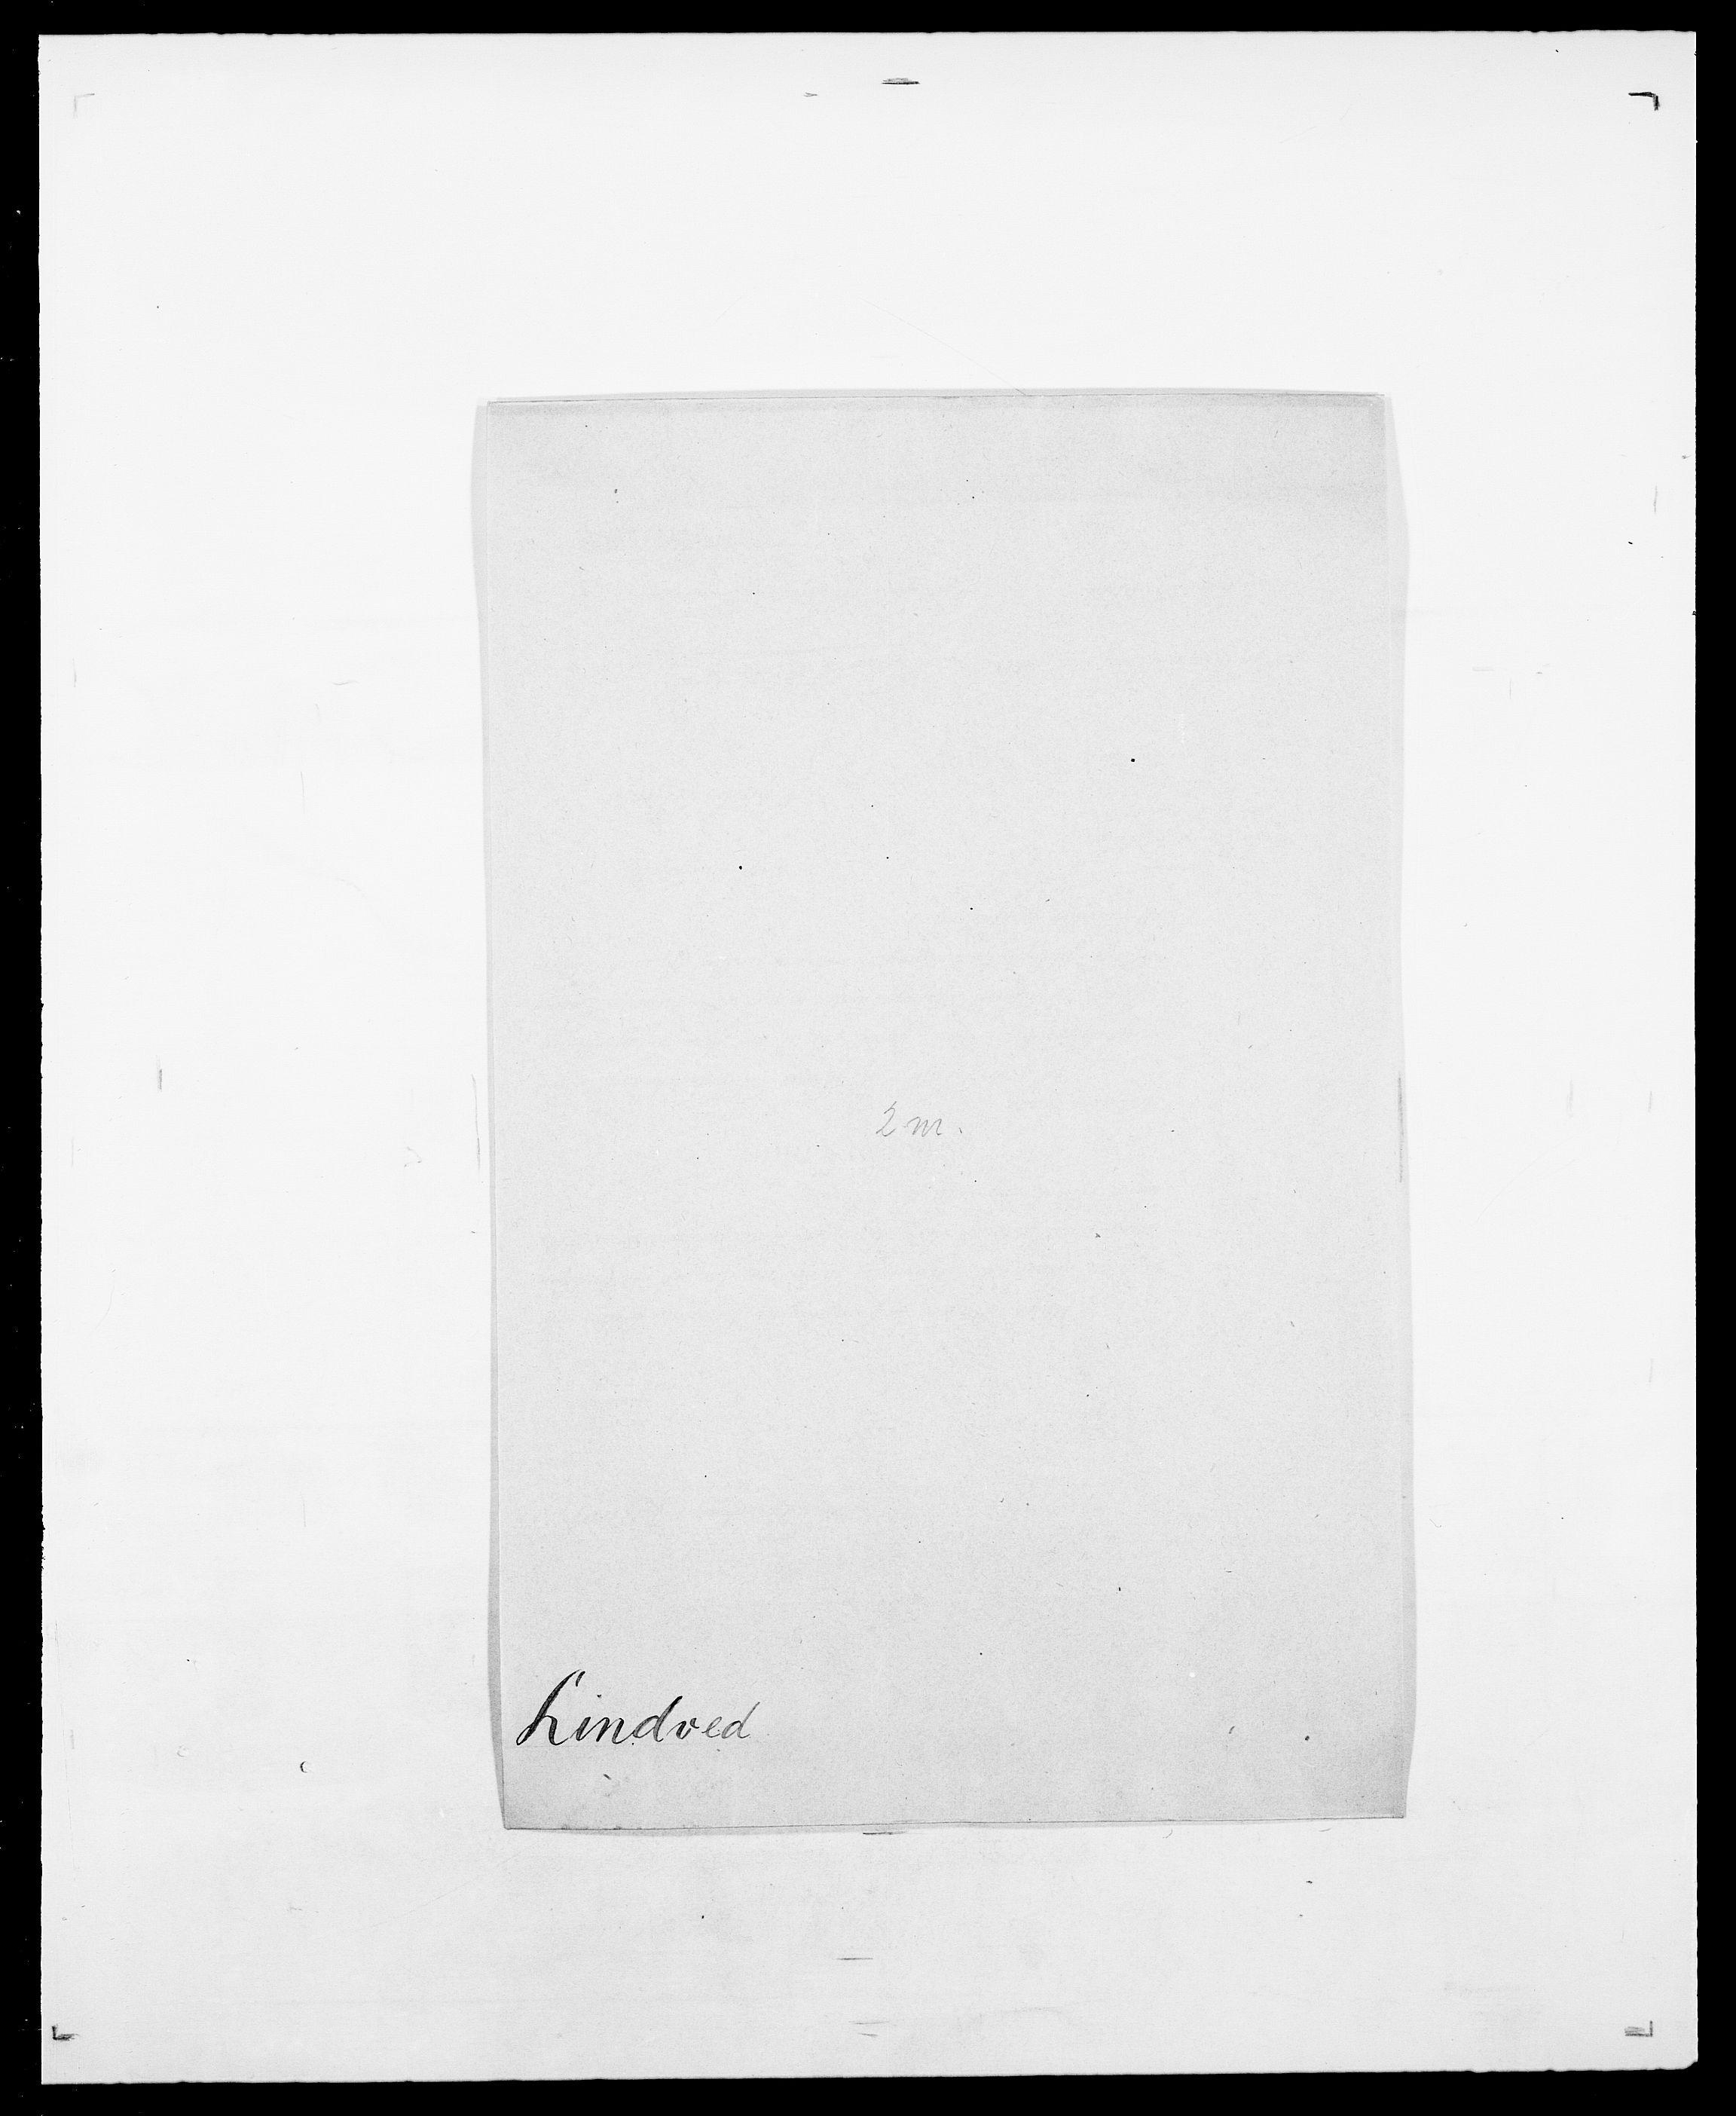 SAO, Delgobe, Charles Antoine - samling, D/Da/L0023: Lau - Lirvyn, s. 634